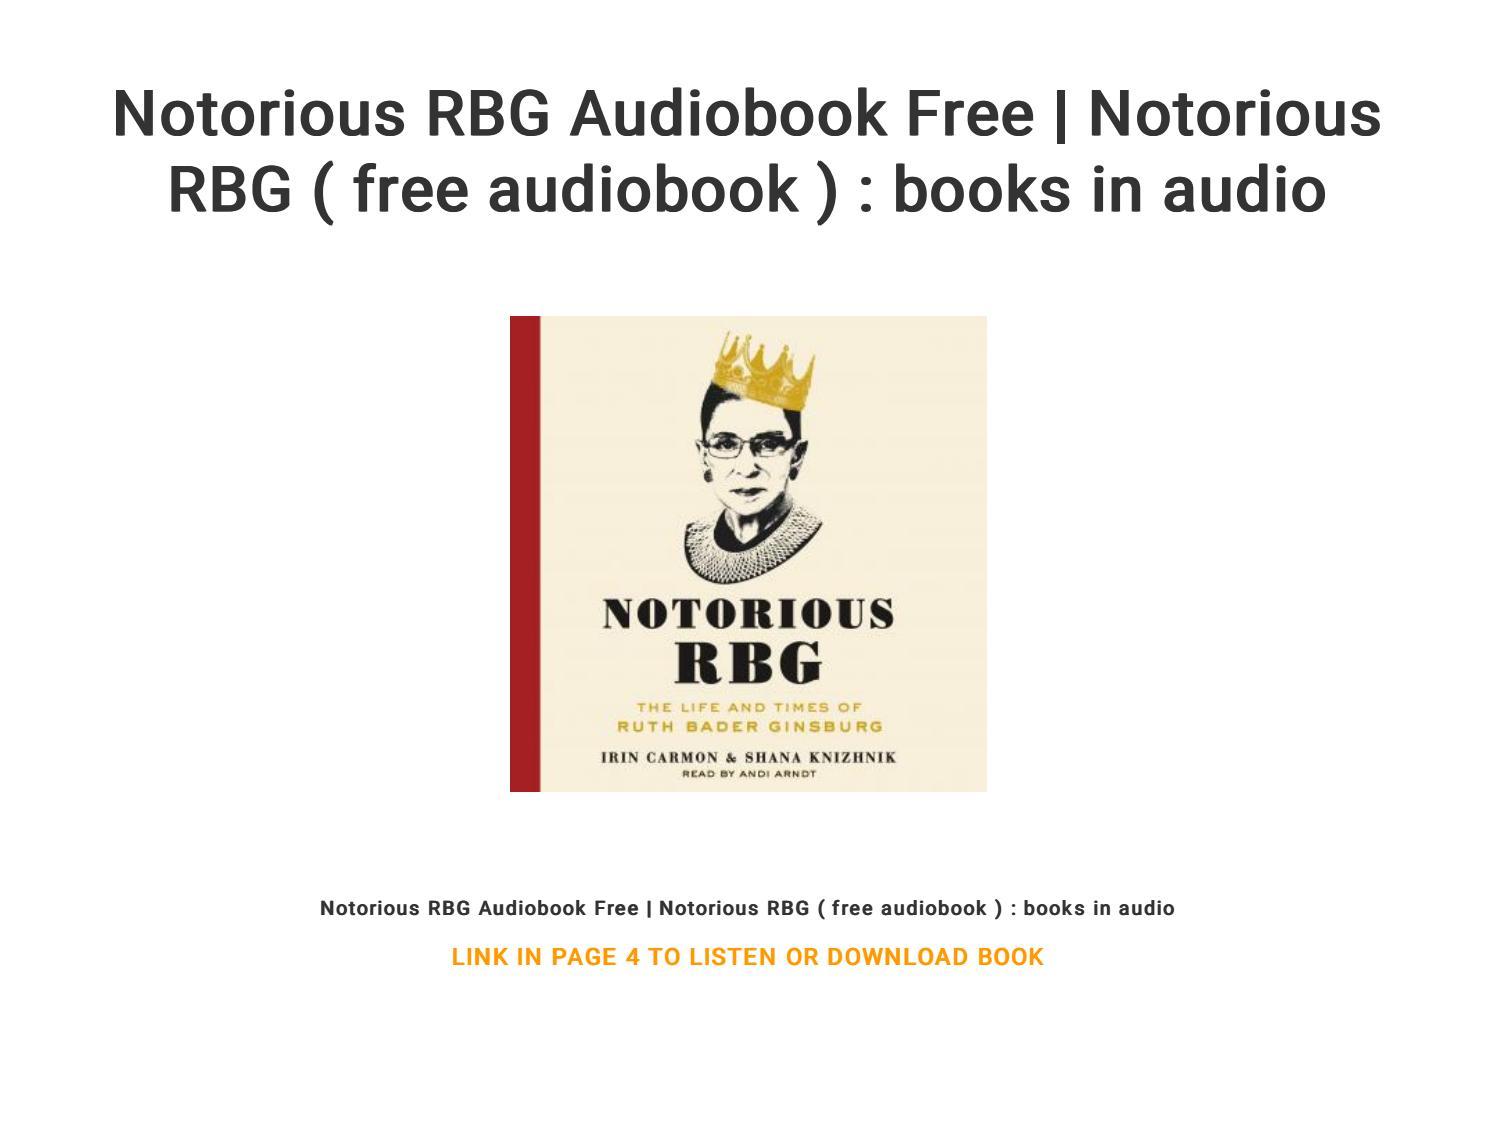 Notorious RBG Audiobook Free   Notorious RBG ( free audiobook ) : books in  audio by busbat66 - issuu